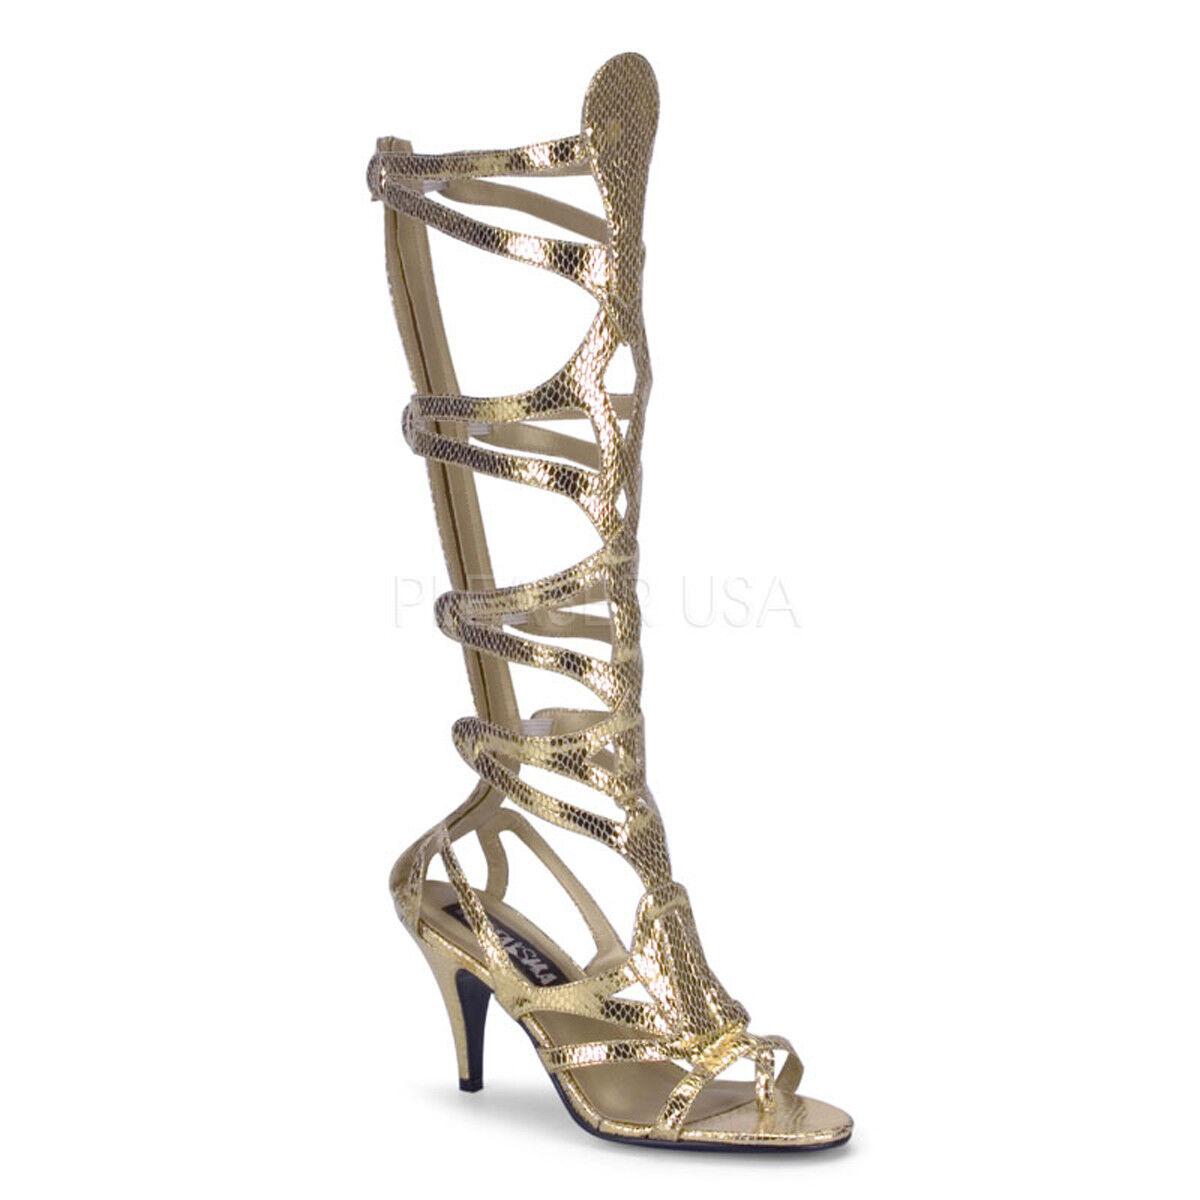 PLEASER FUNTASMA Goddess-12 gold Snakeprint Gladiator Goddess Costume Sandals